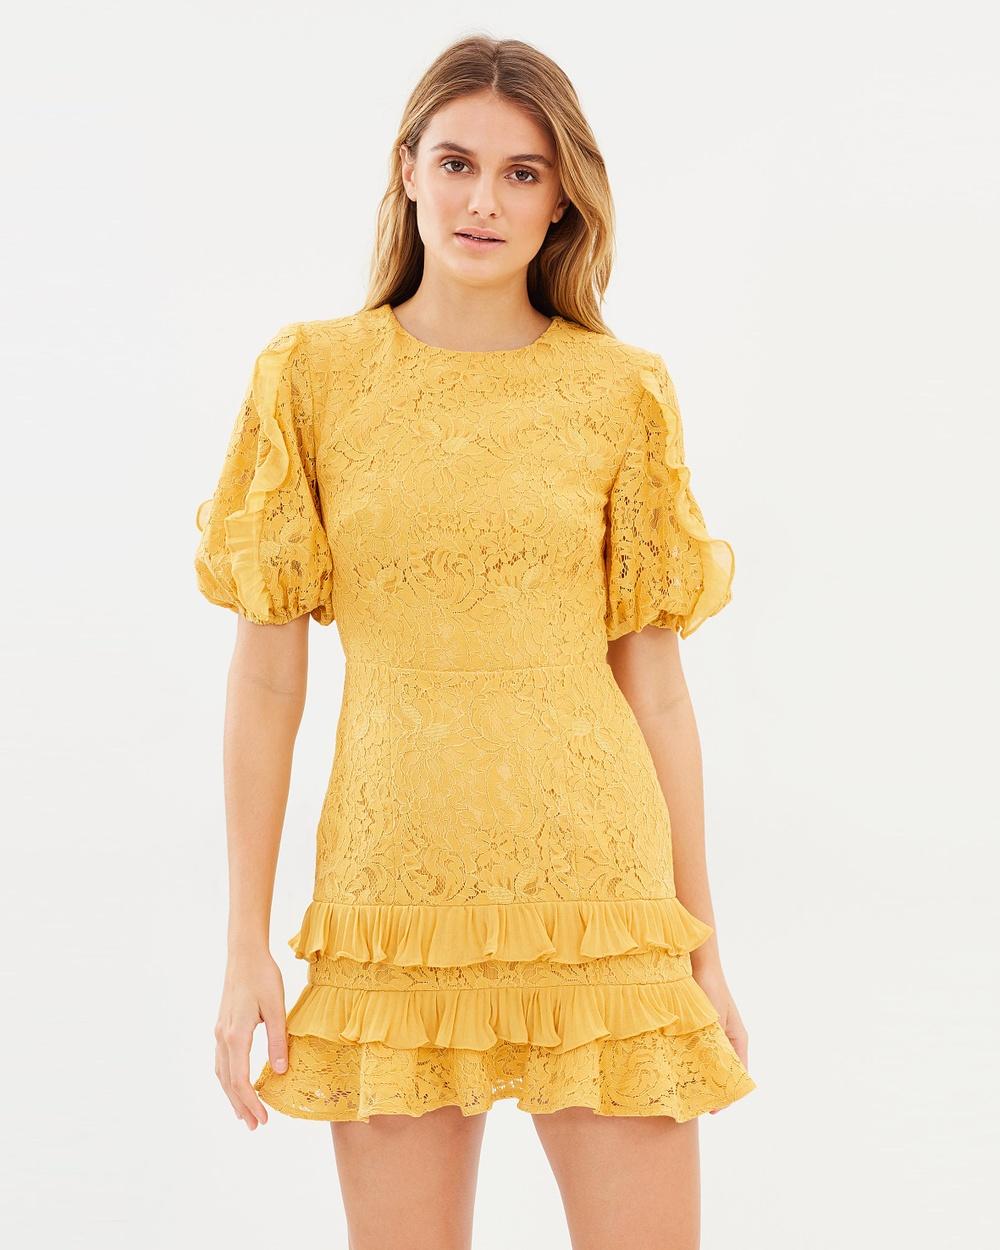 Photo of Keepsake the Label Golden Yellow Timeless Lace Mini Dress - buy Keepsake the Label dresses on sale online